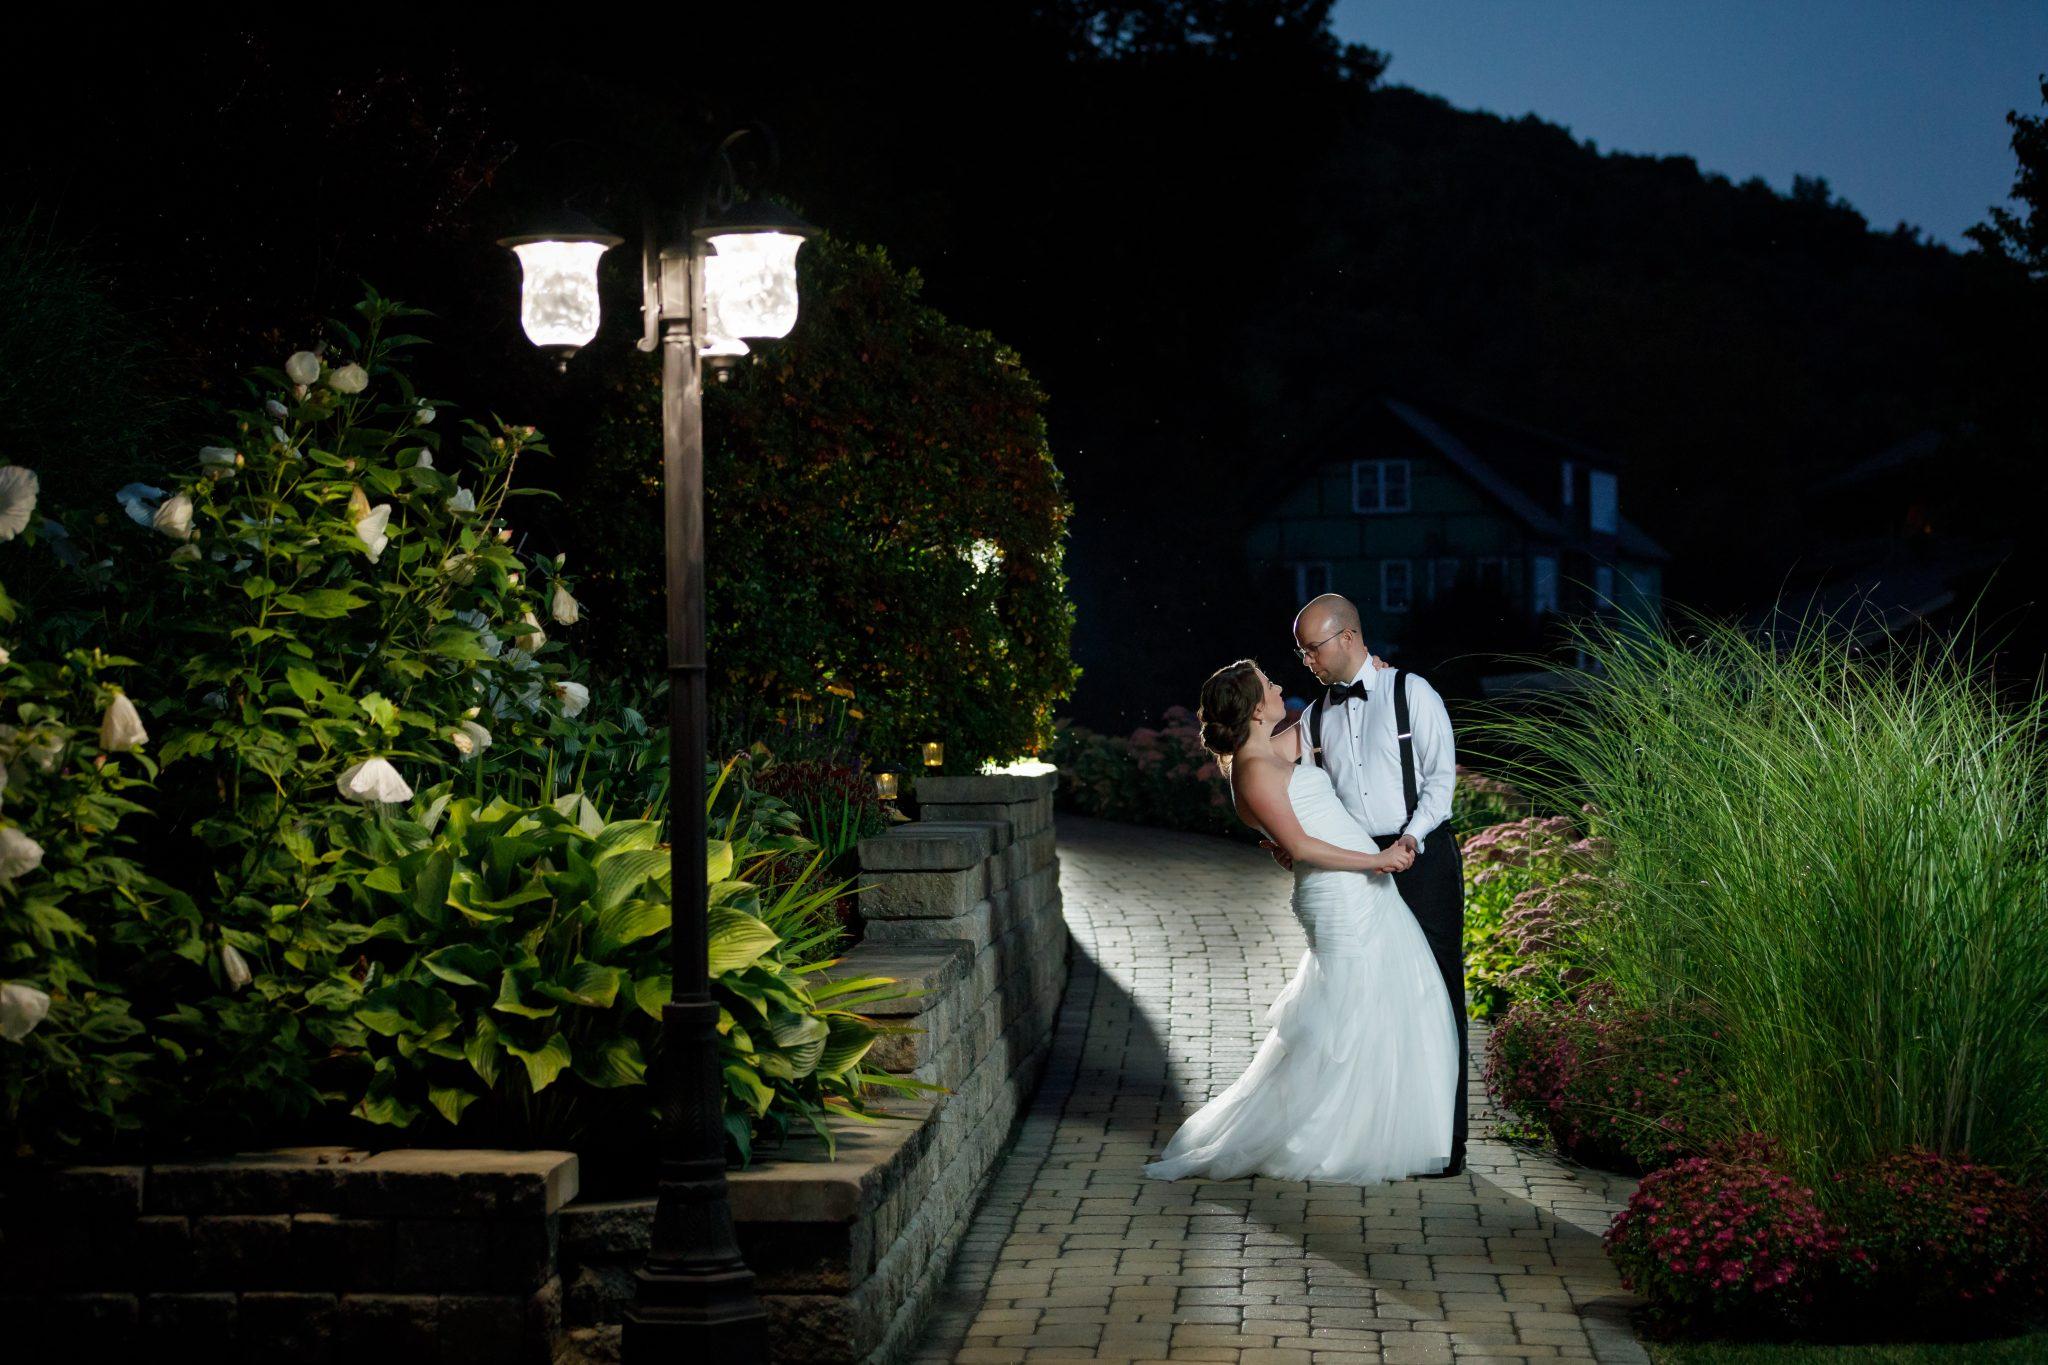 The Mountain Rose Inn wedding couple night time portrait